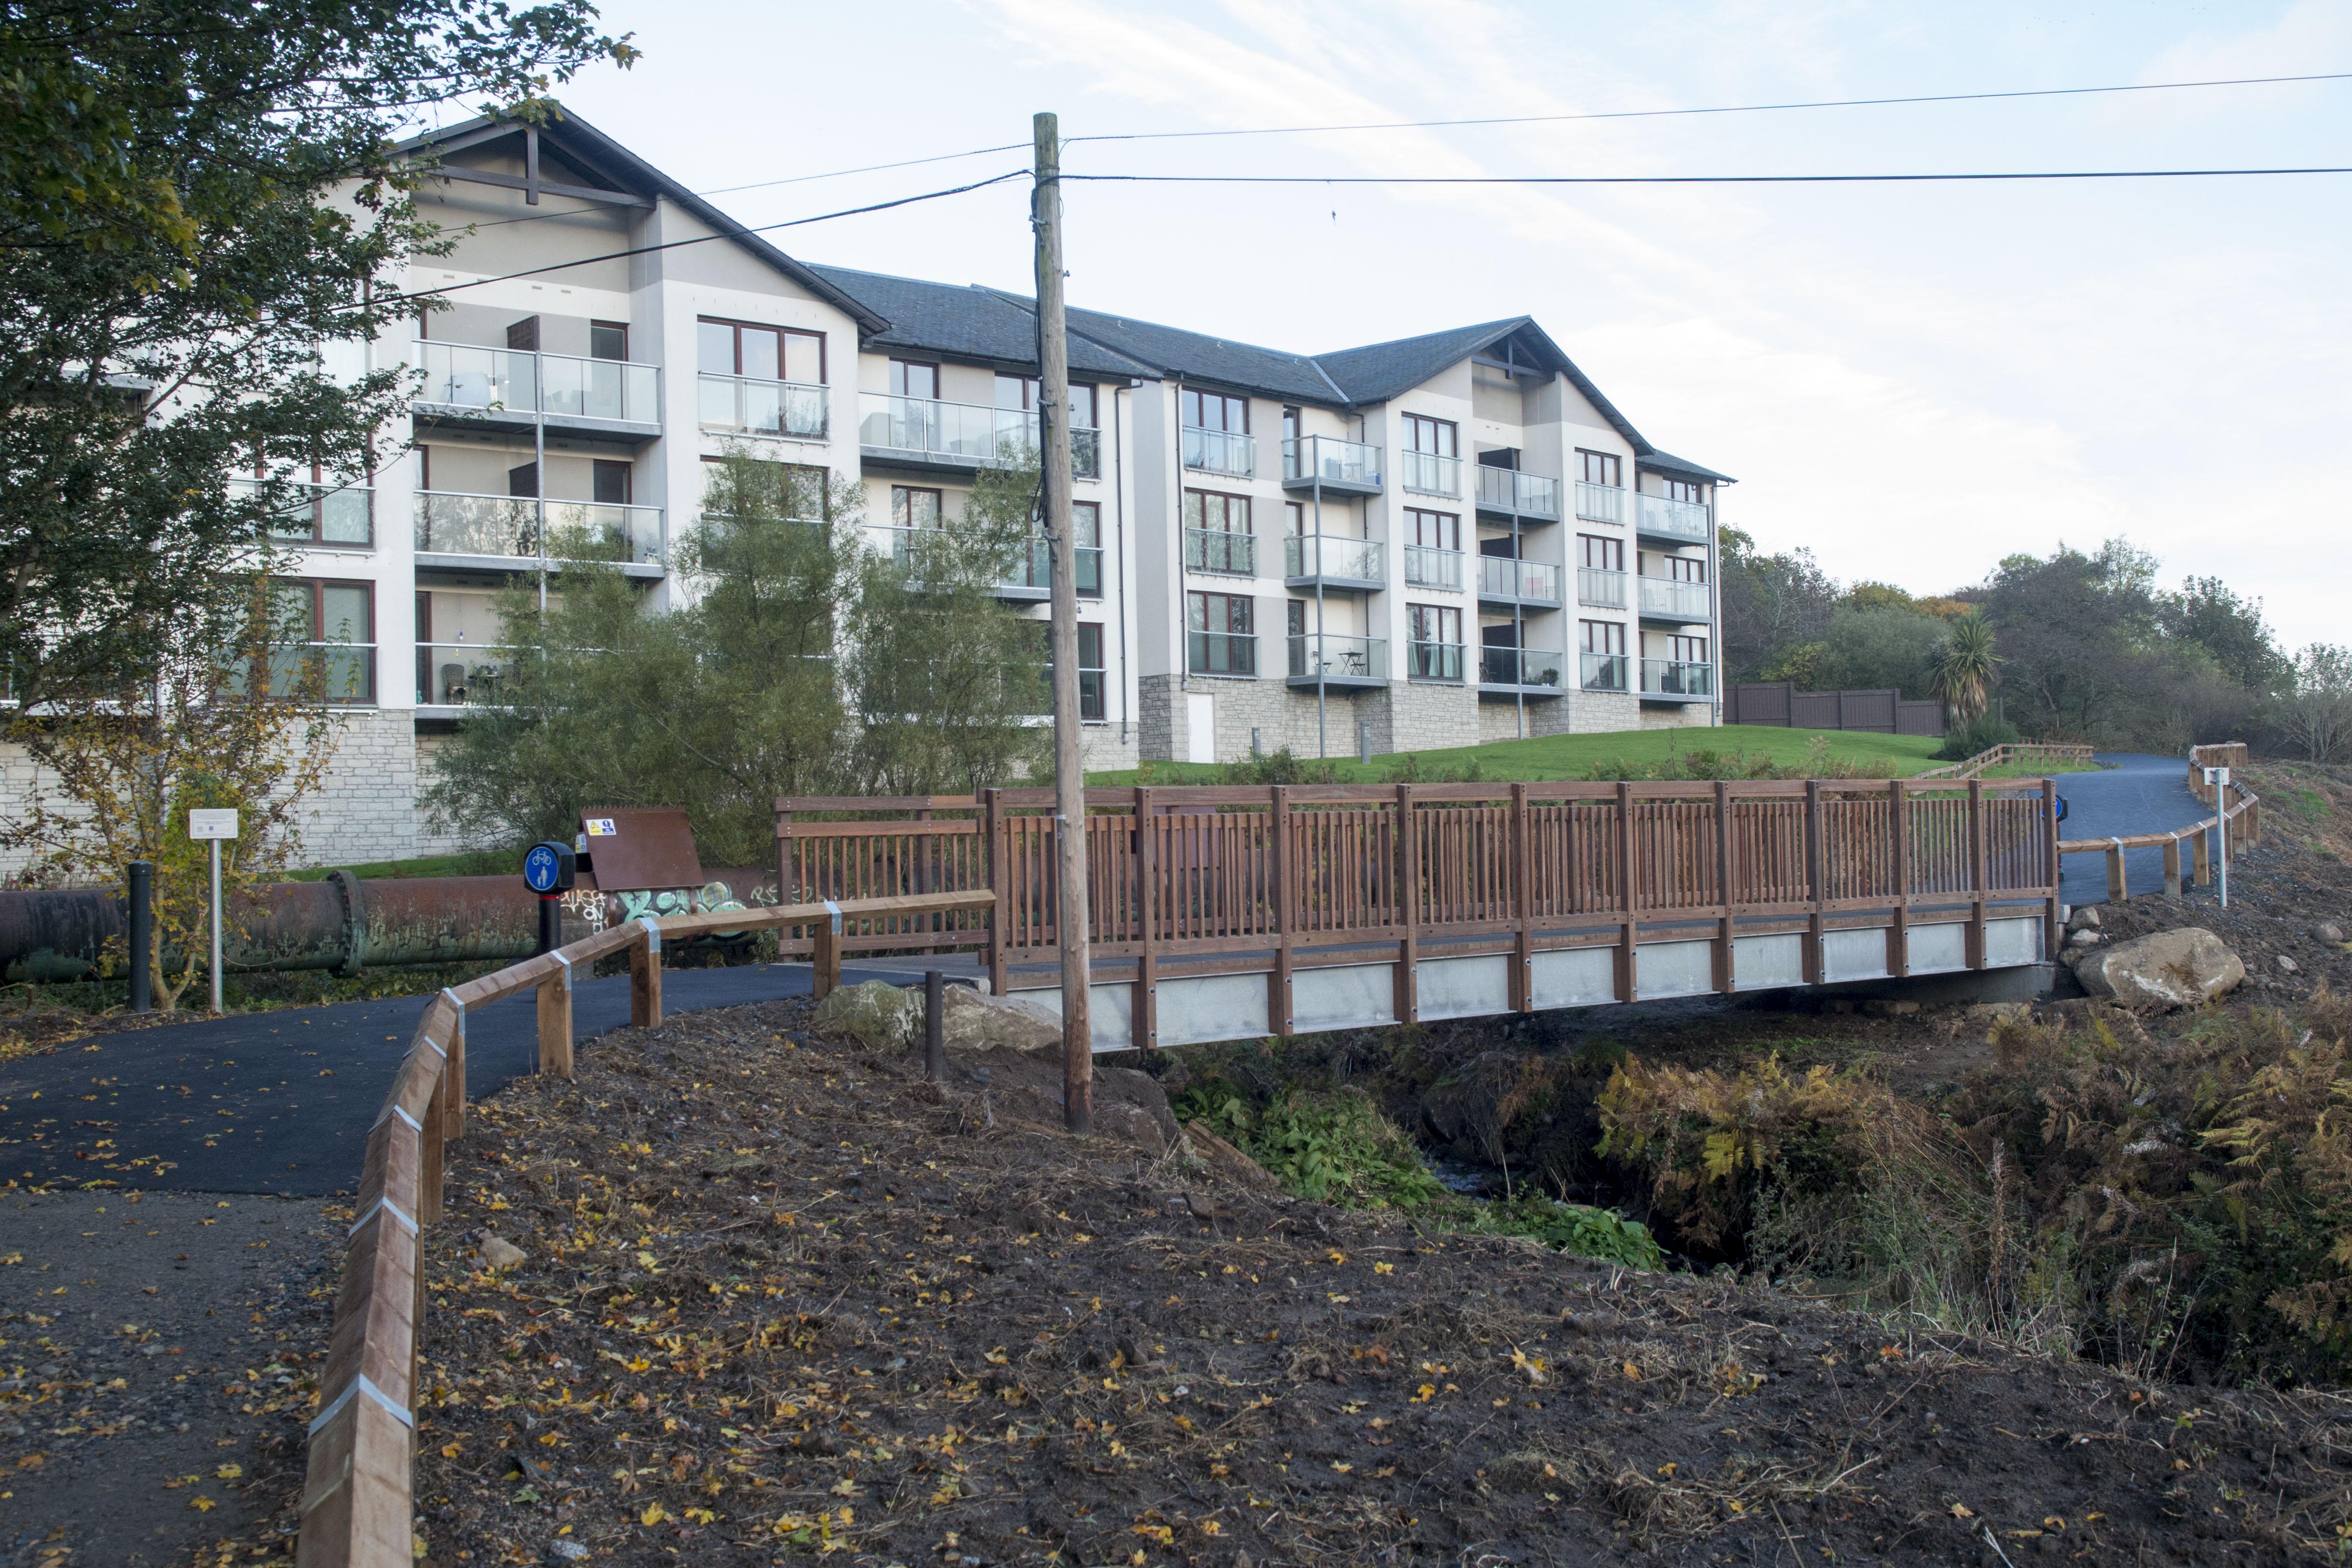 The new Farburn Bridge in Dyce